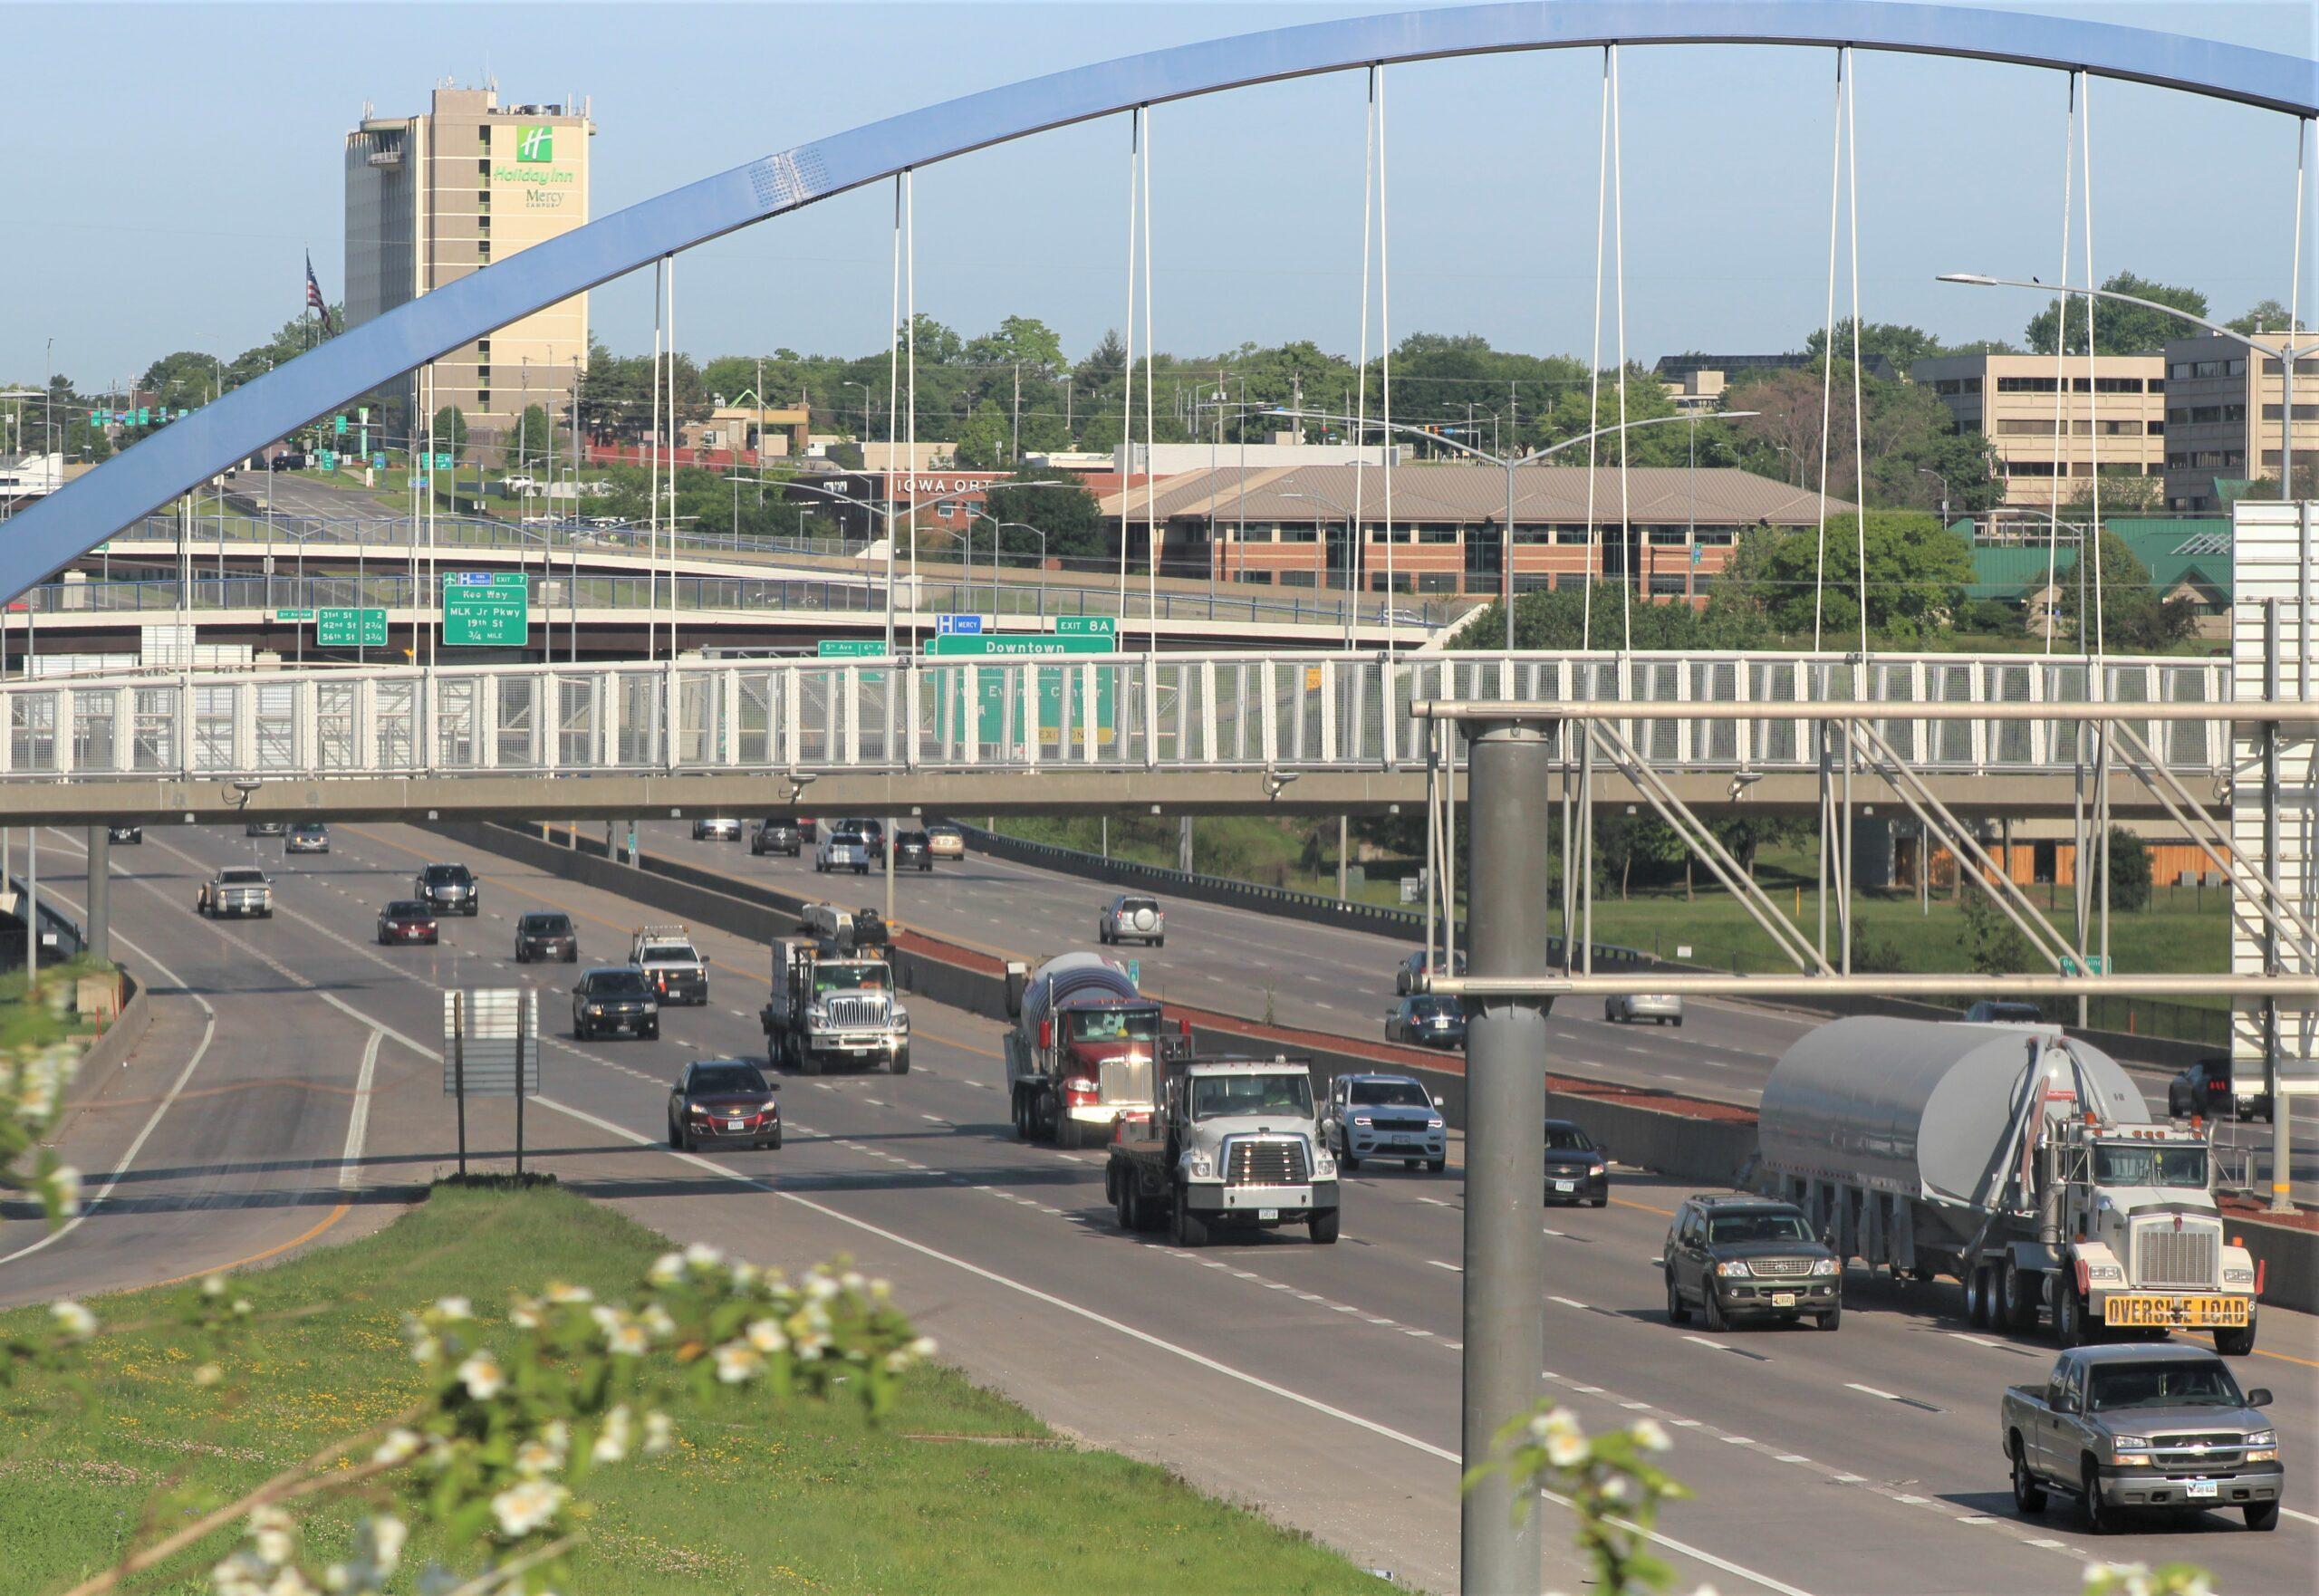 Vermeer exec: Infrastructure bill would be 'transformative'